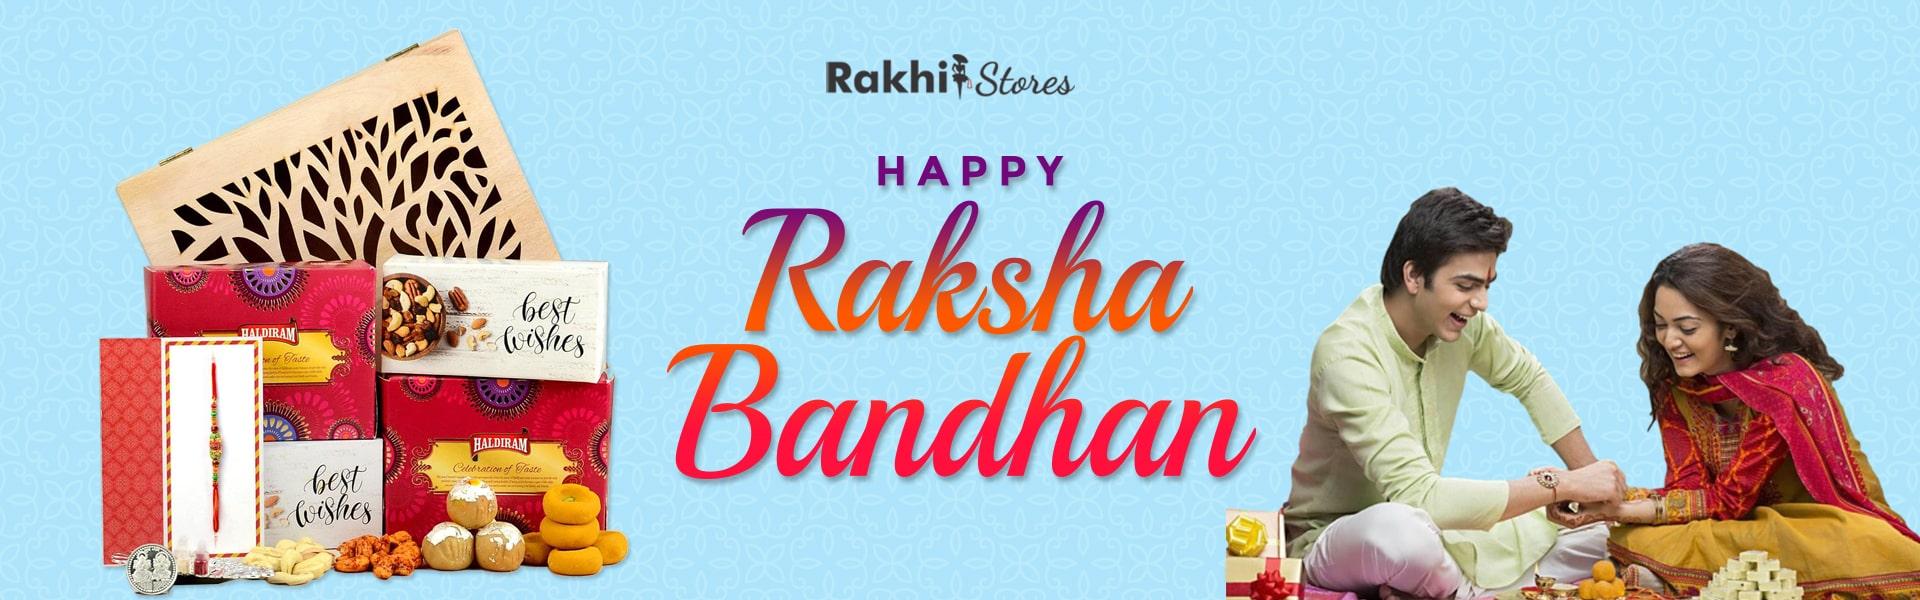 Rakhi Store India